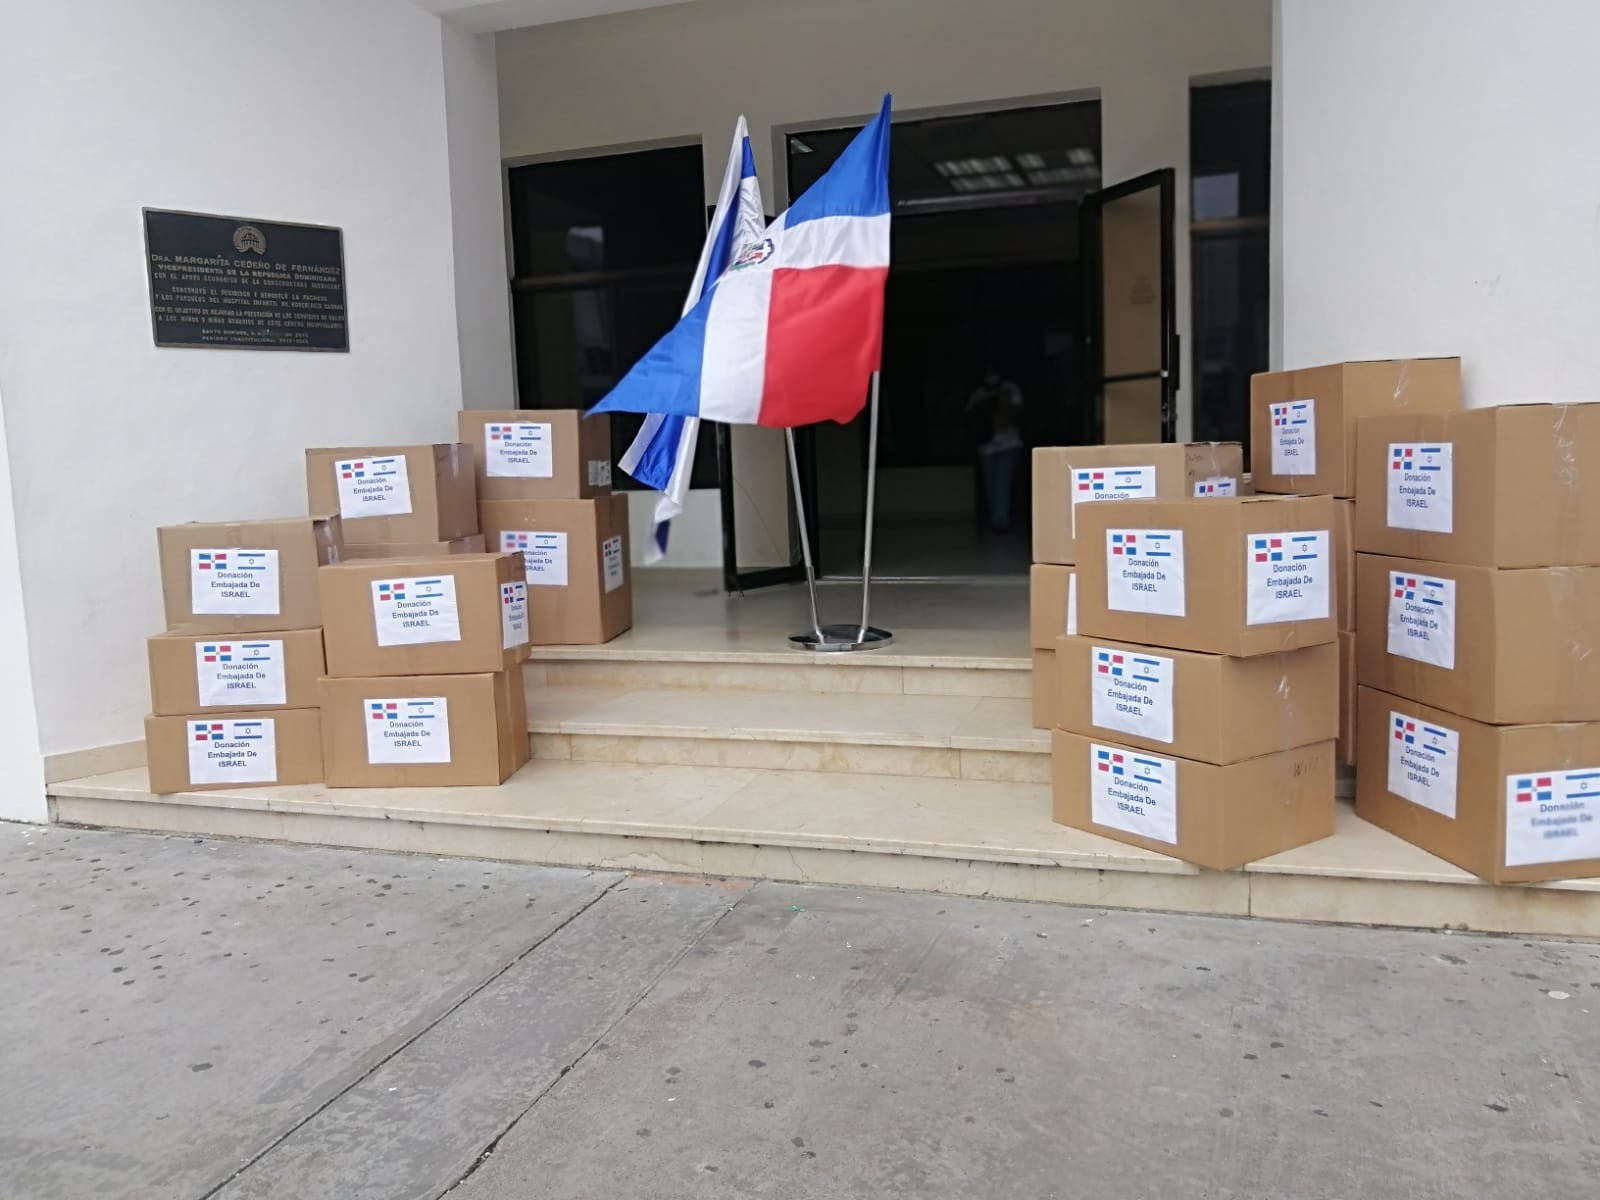 Israel dona insumos médicos al Hospital Infantil Robert Reid Cabral